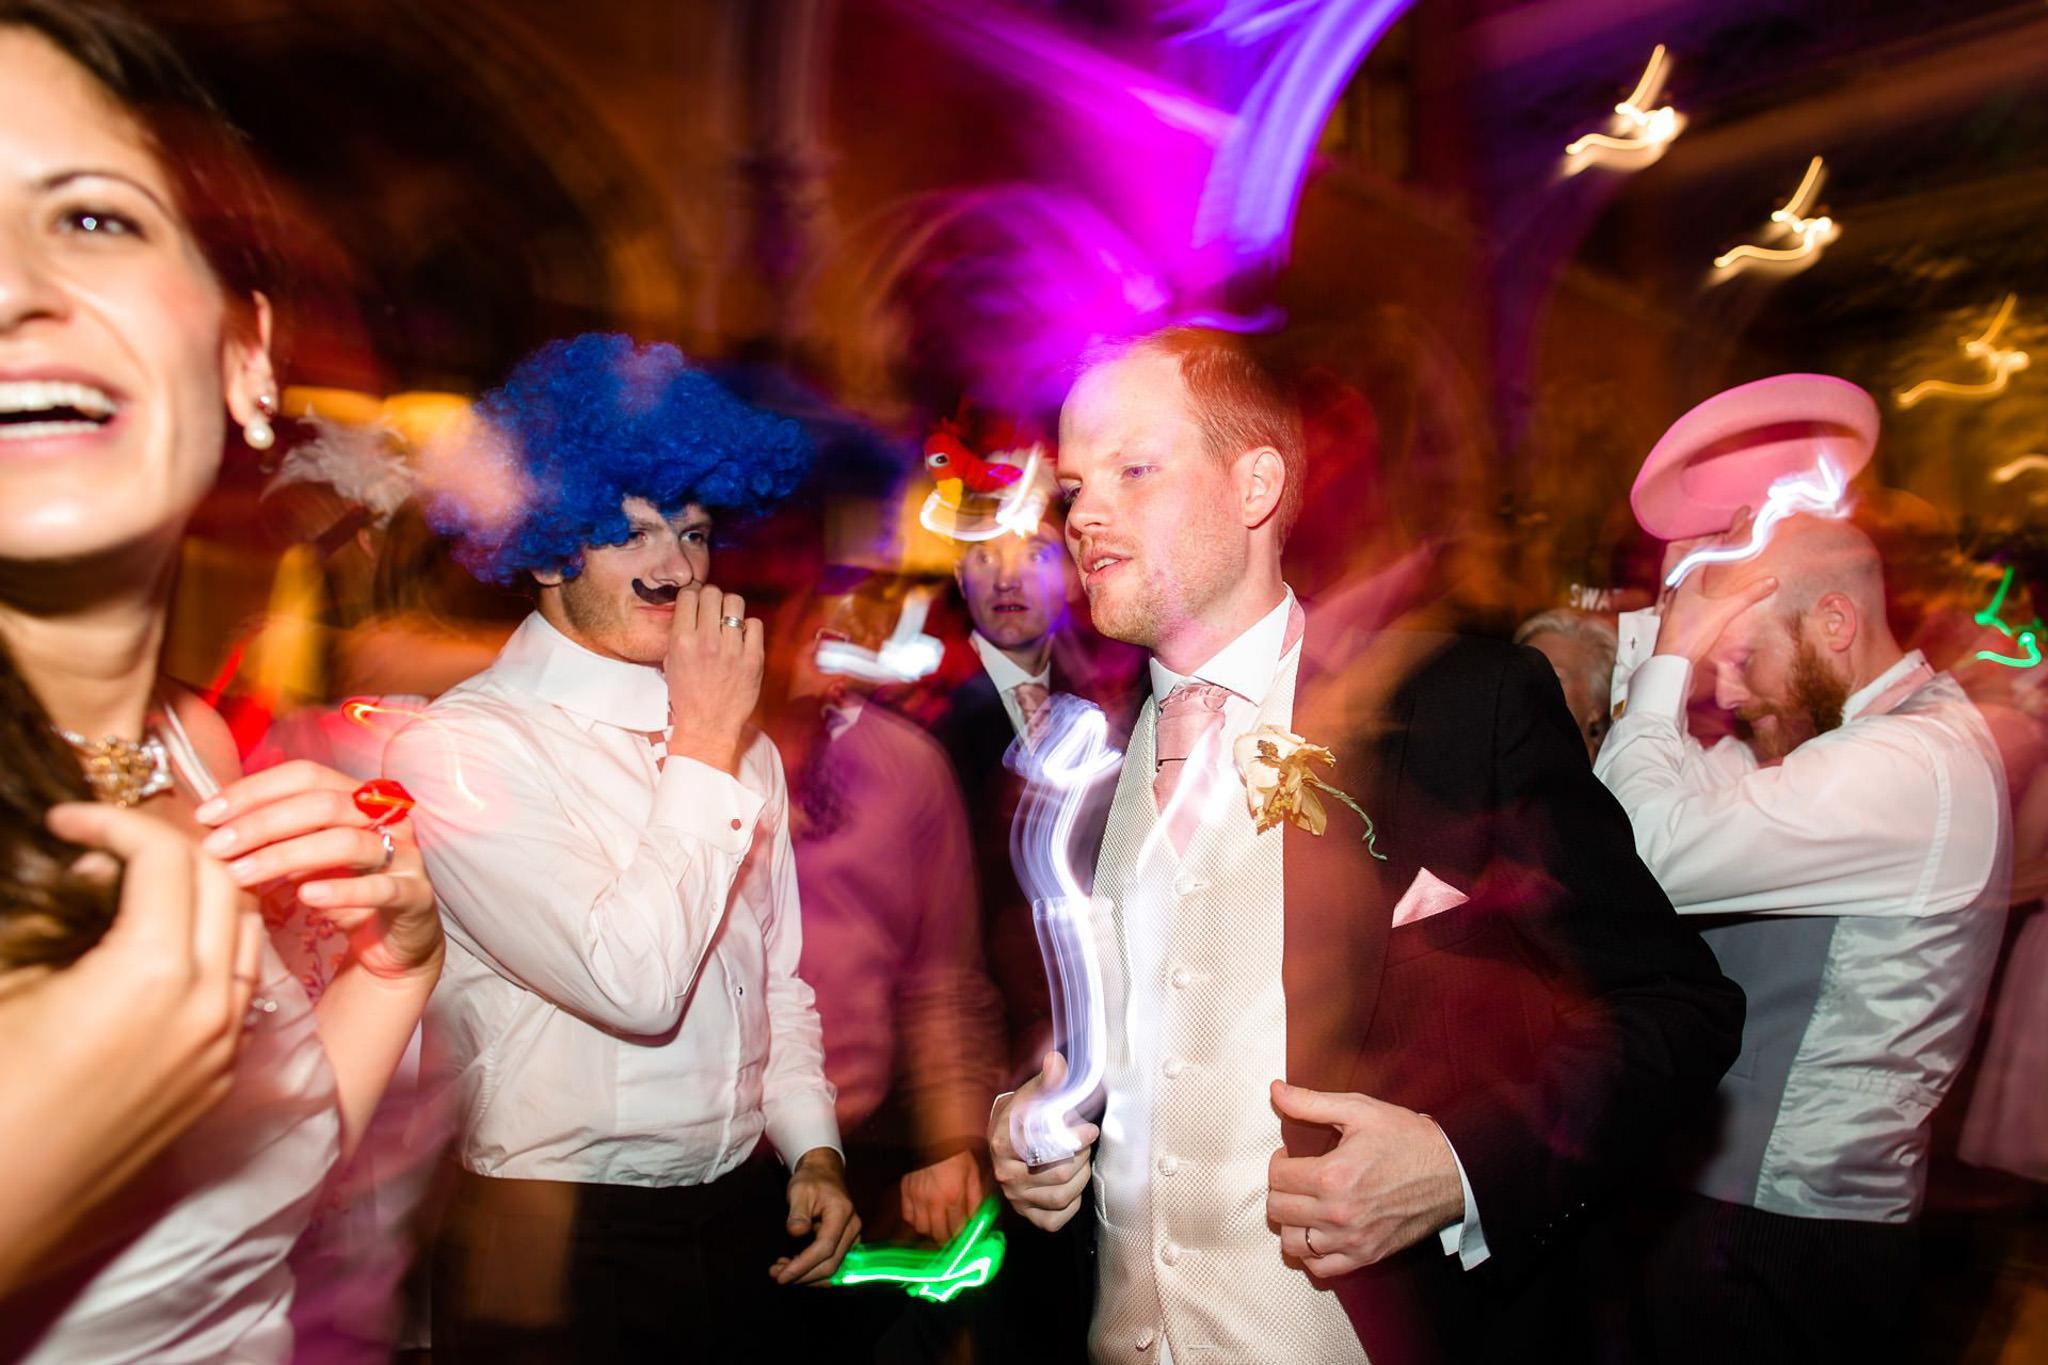 St. Pancras hotel wedding groom dancing